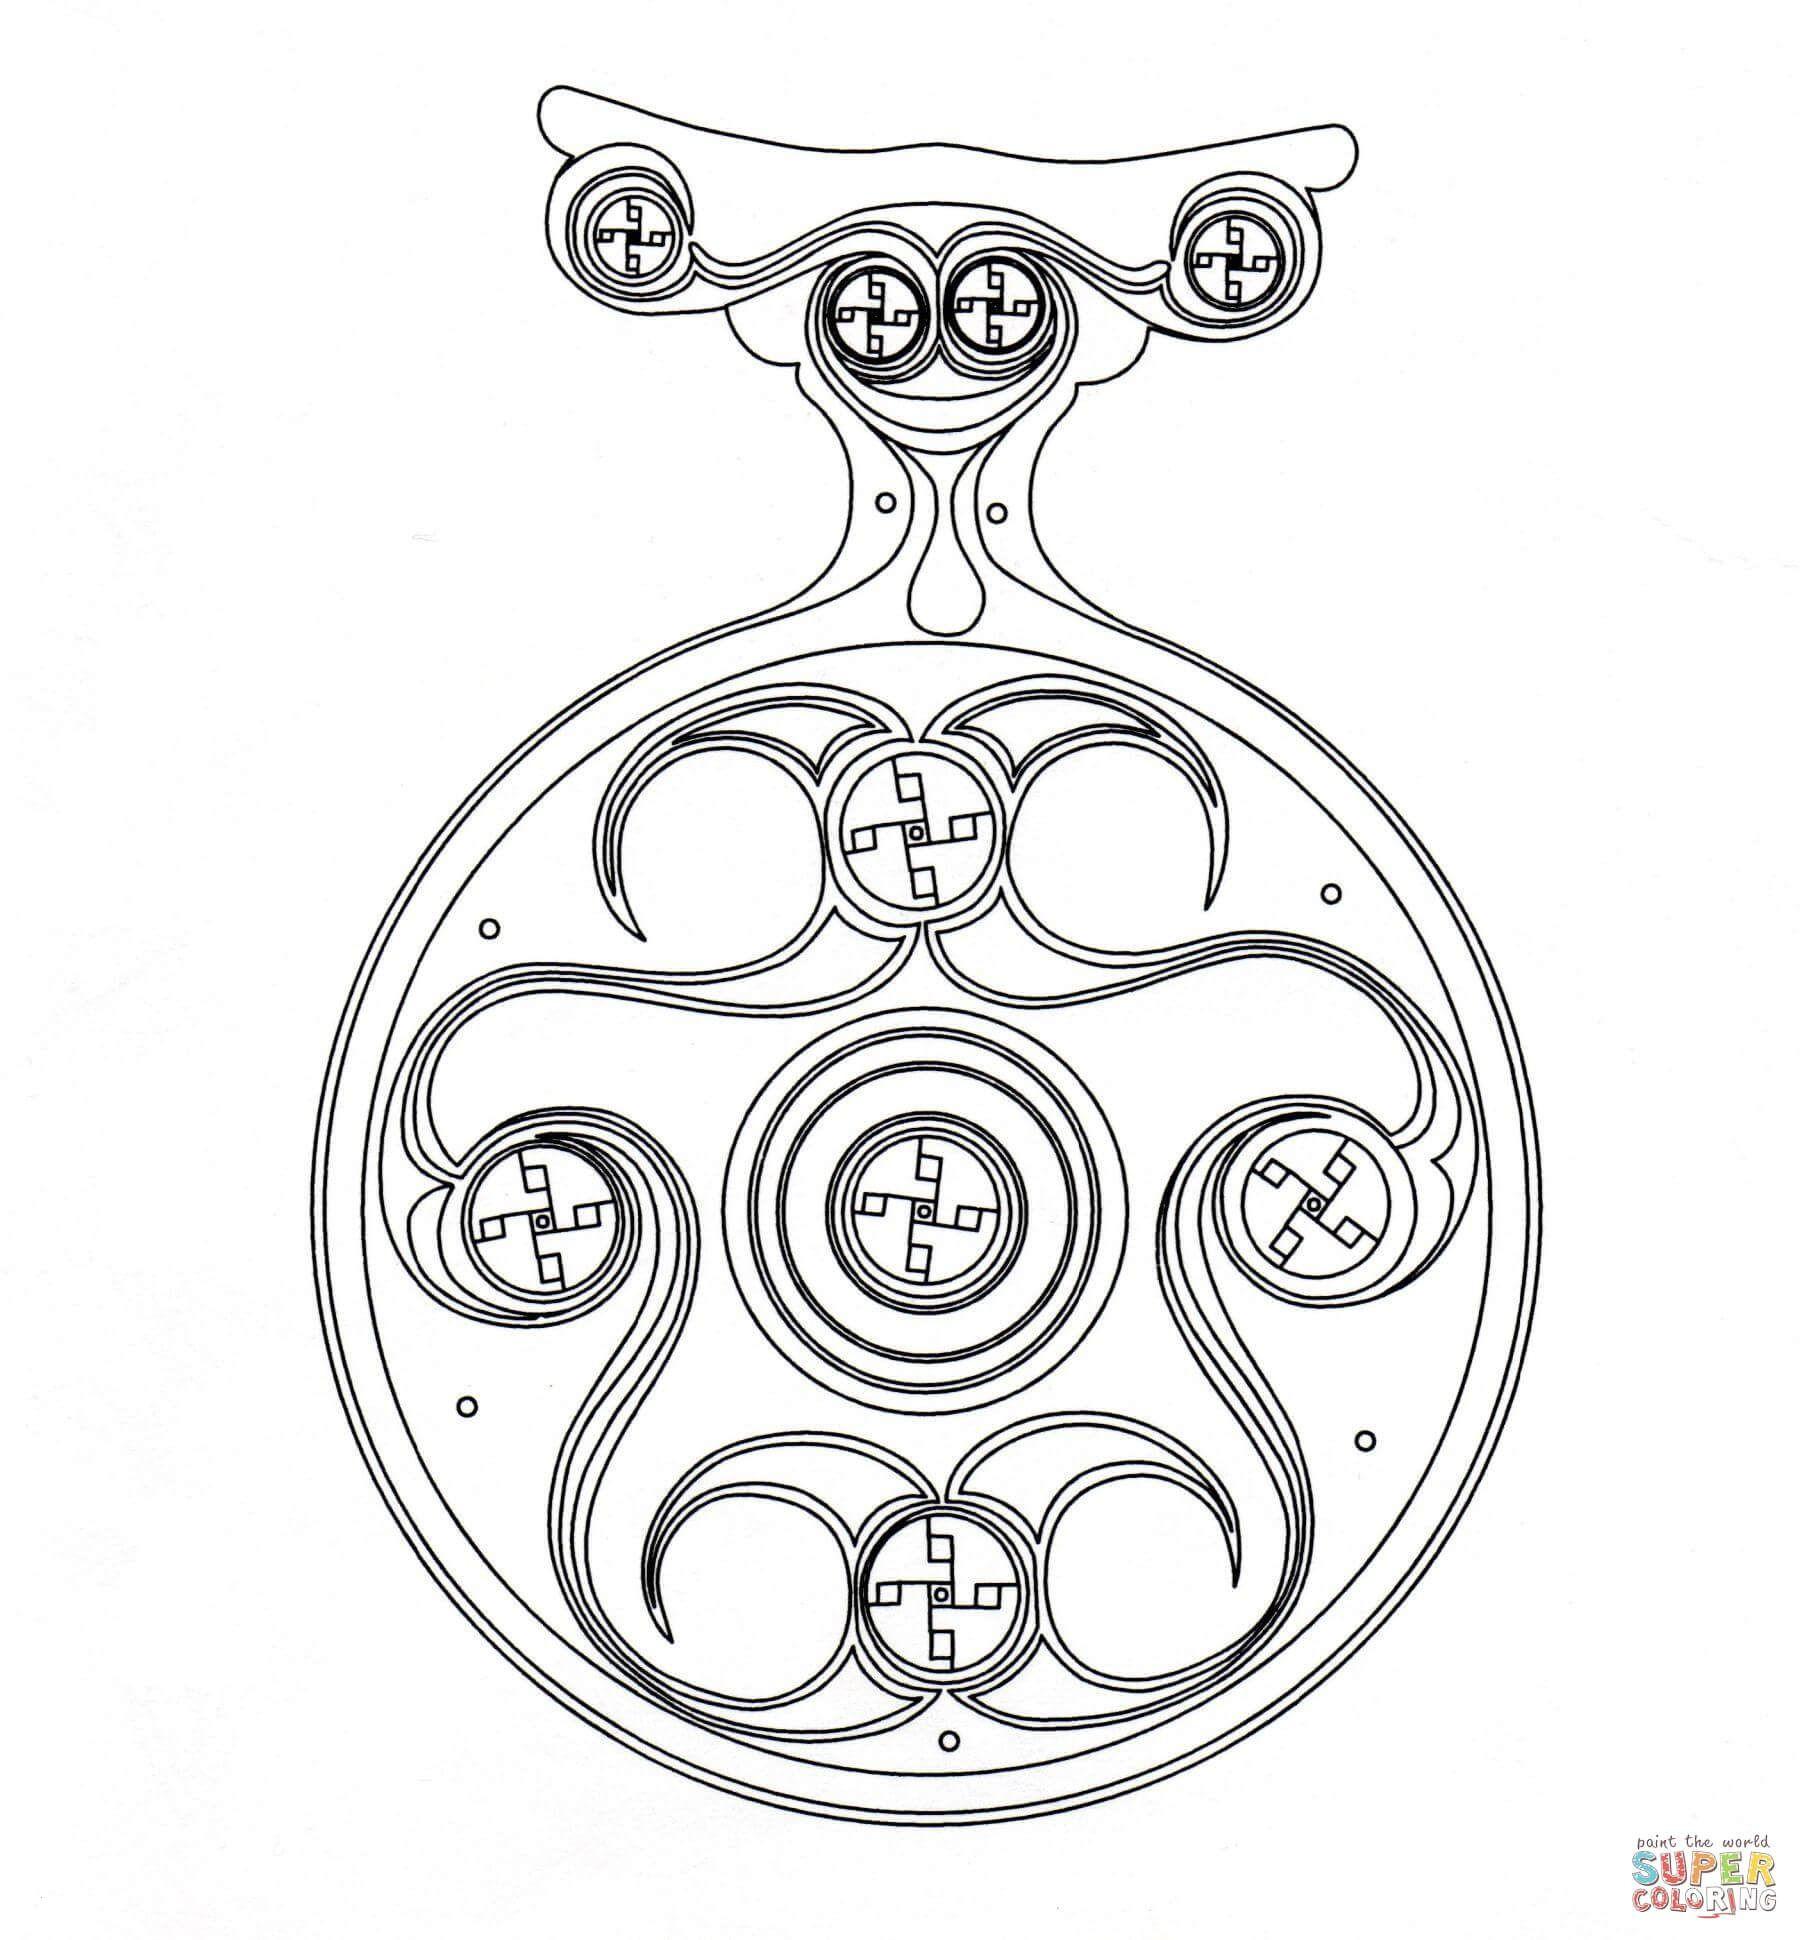 Malvorlage Blumen ornamente Frisch Malvorlagen 1001 Luxus Celtic ornament ornament 3 Celtic Middle Ages Bilder